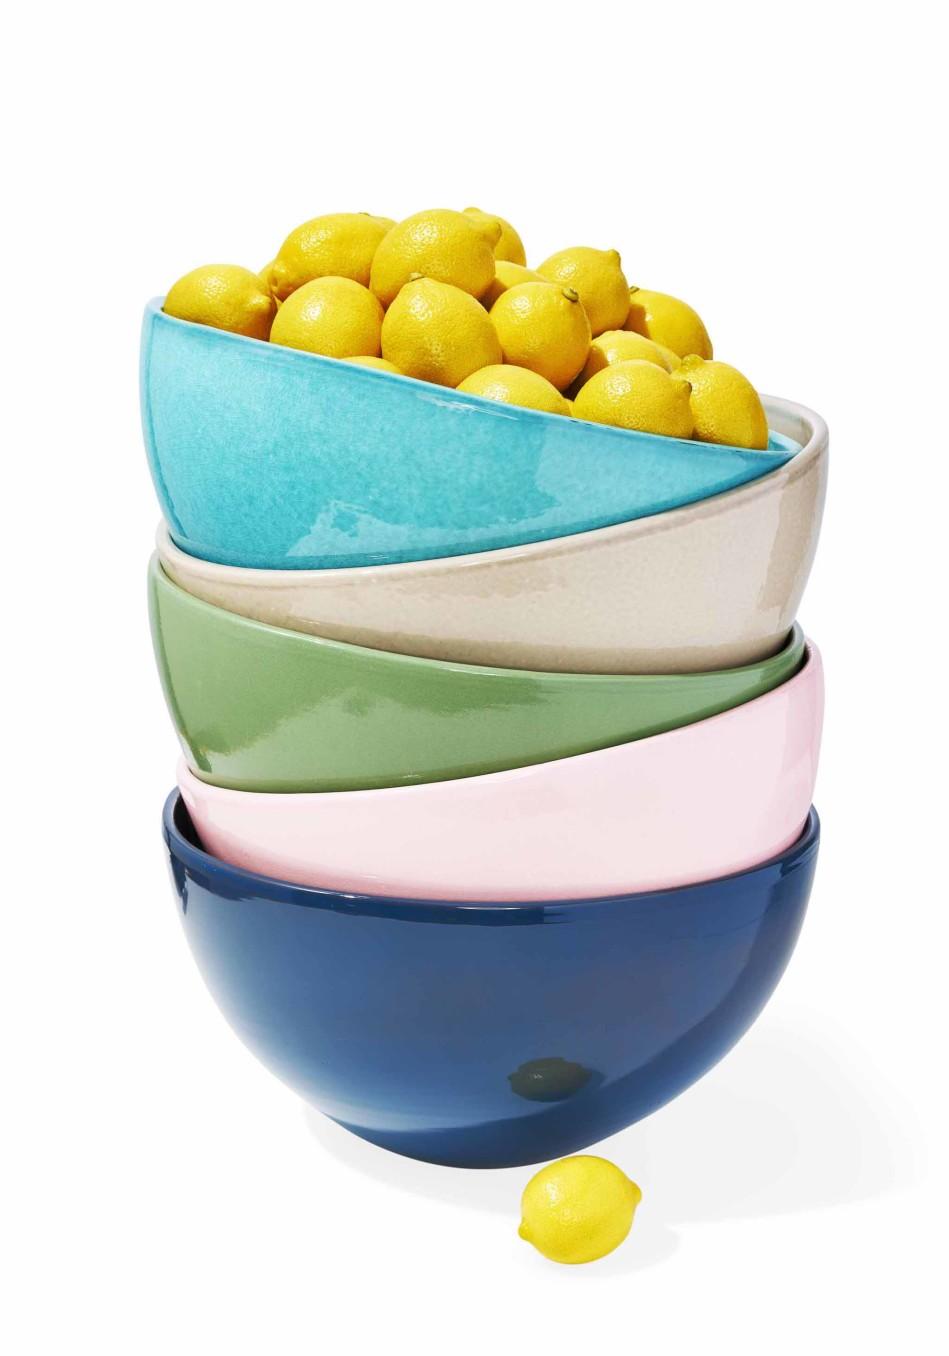 Oprahs Favorite Things 2016 Full List Terracotta Bowls : 201612 omag oprah favorite things sintra bowls 949x1356 from www.oprah.com size 949 x 1356 jpeg 133kB